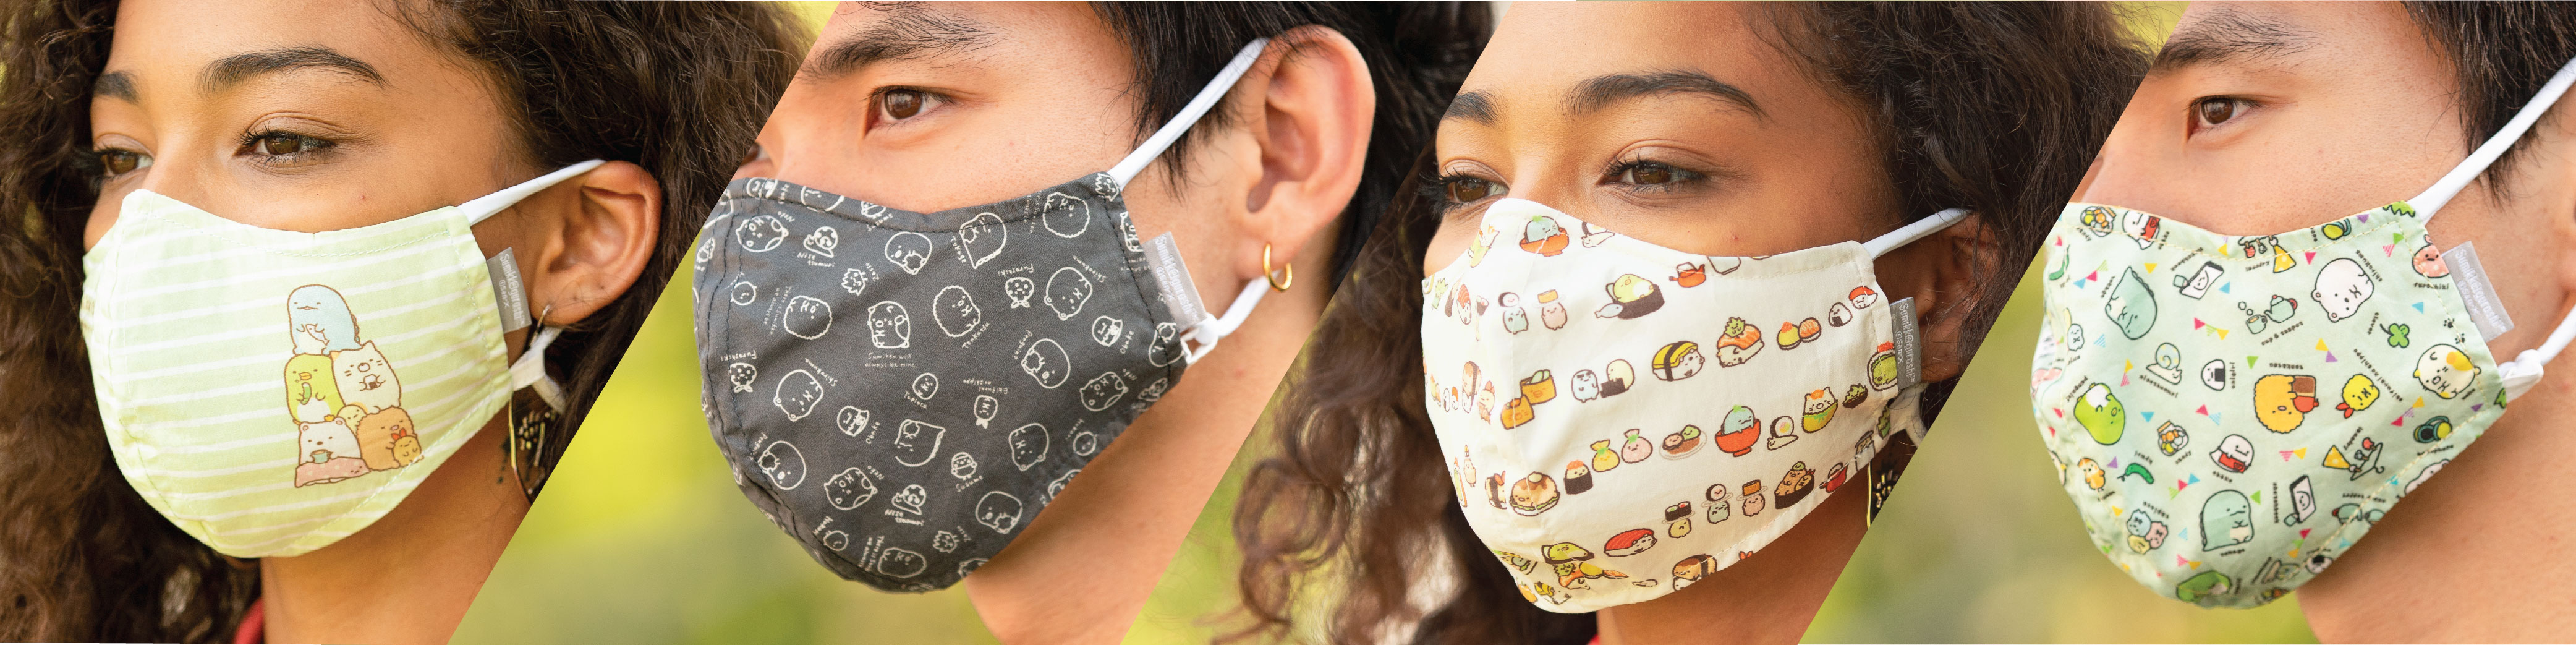 sumikkogurashi-facemasks-banner-01-03.jpg